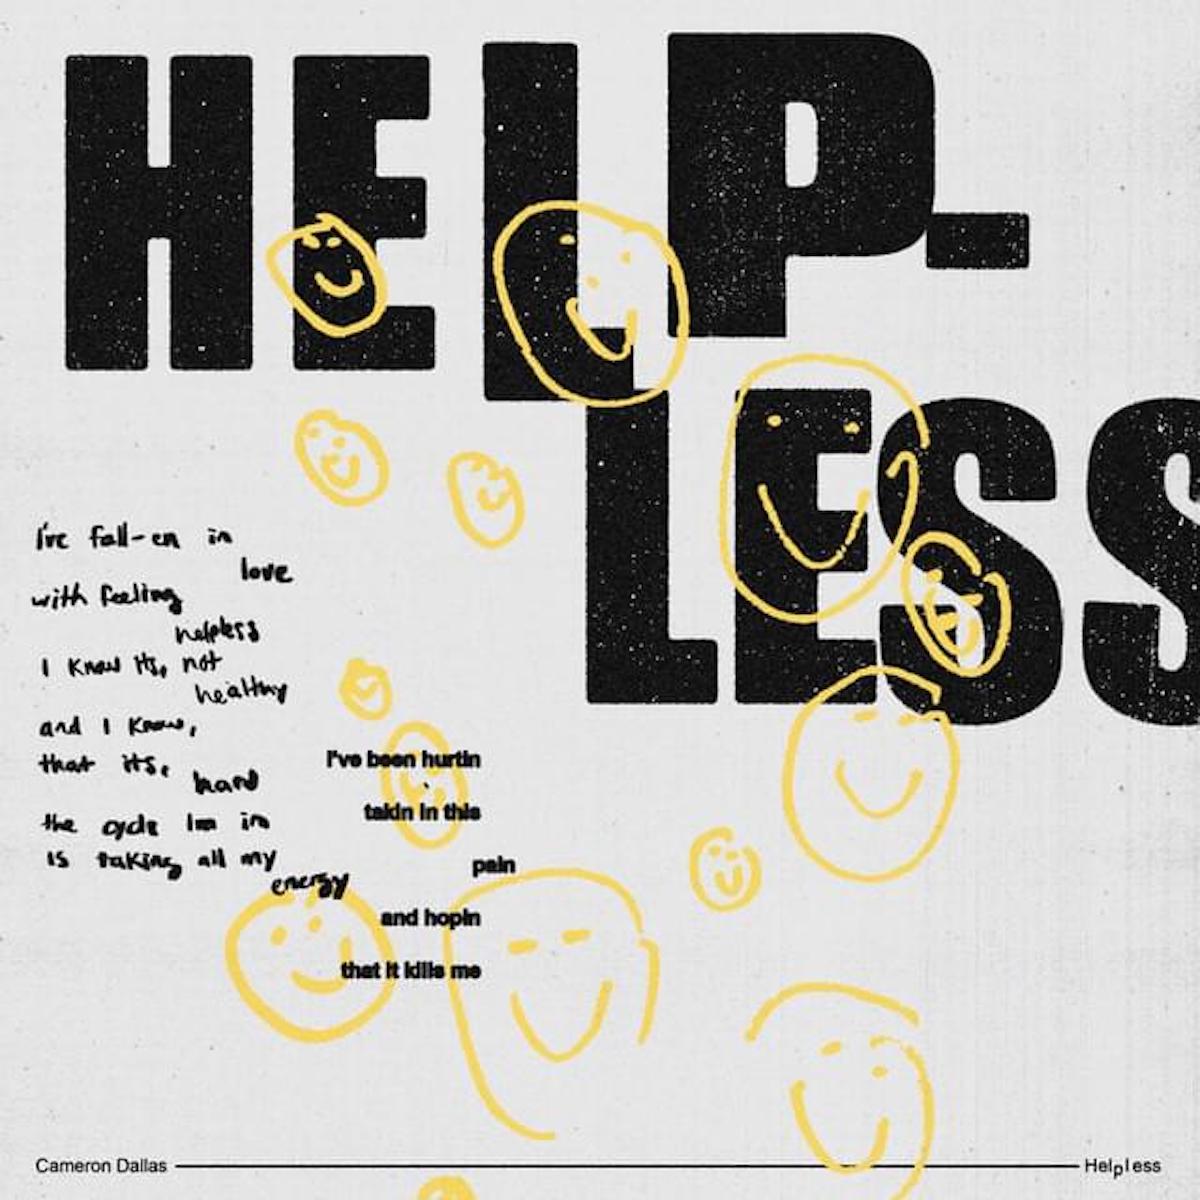 Cameron Dallas - Helpless (TruthStudios)